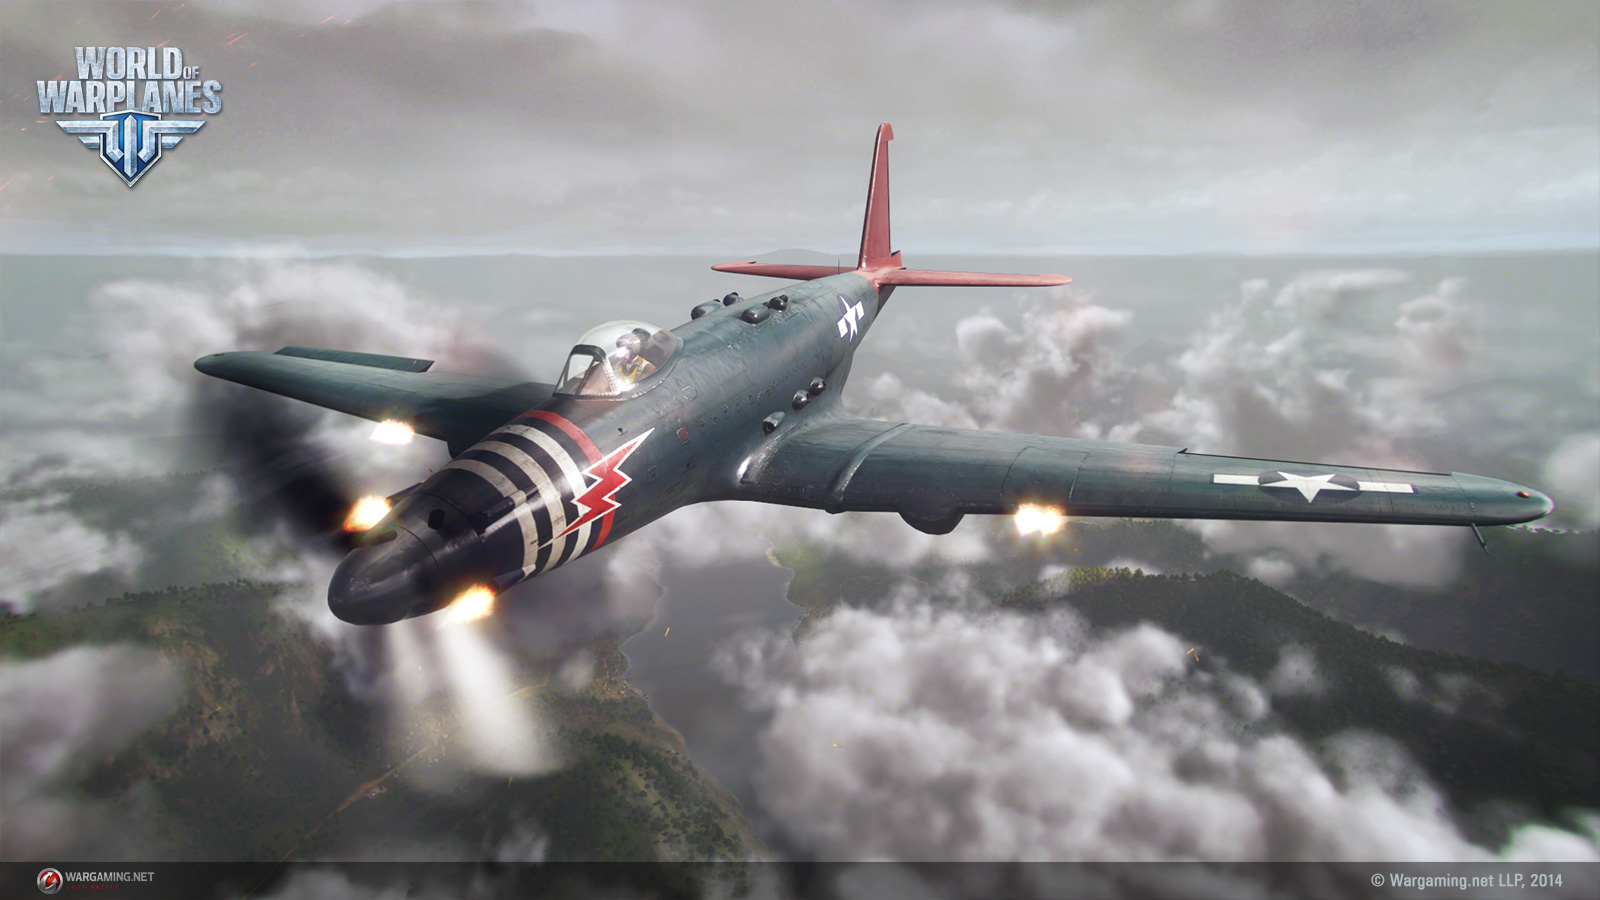 WoWP_Screens_Warplanes_USA_XF_75_Image_02